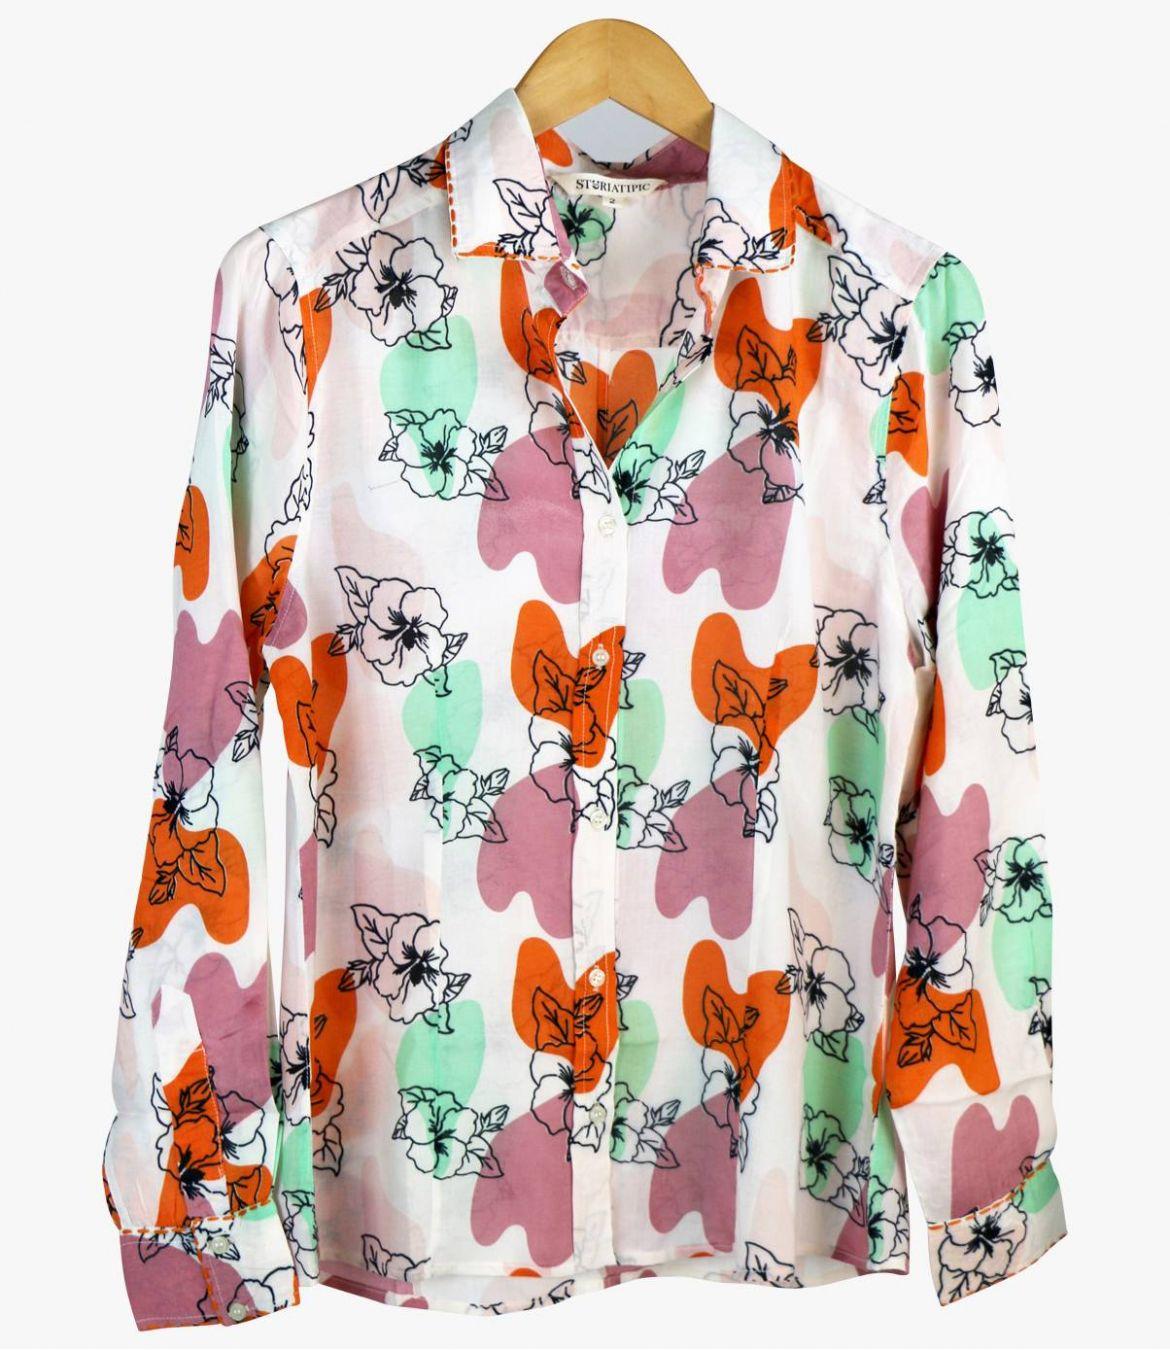 BONI VANYA Women's Modal Shirt Storiatipic - 3